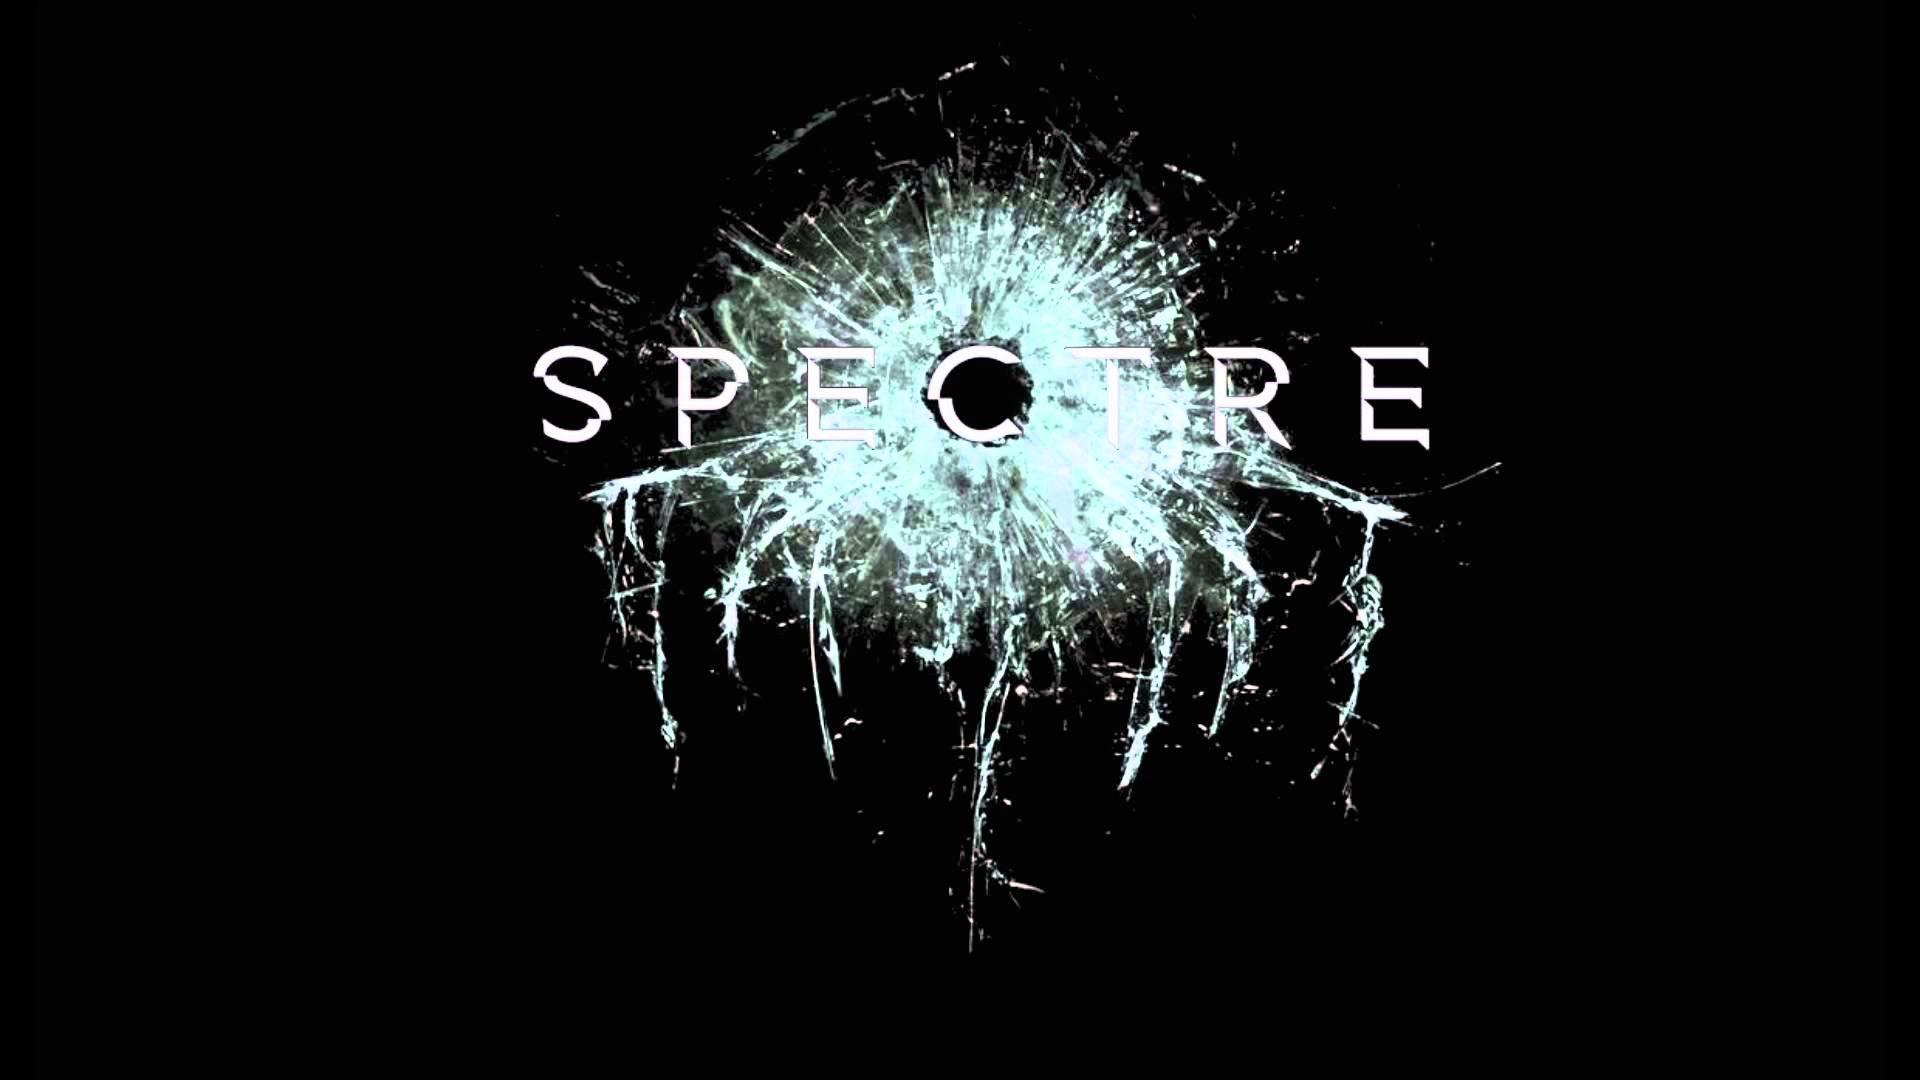 Spectre 007 Movie Logo Wallpaper HD Black BAckground 1920x1080